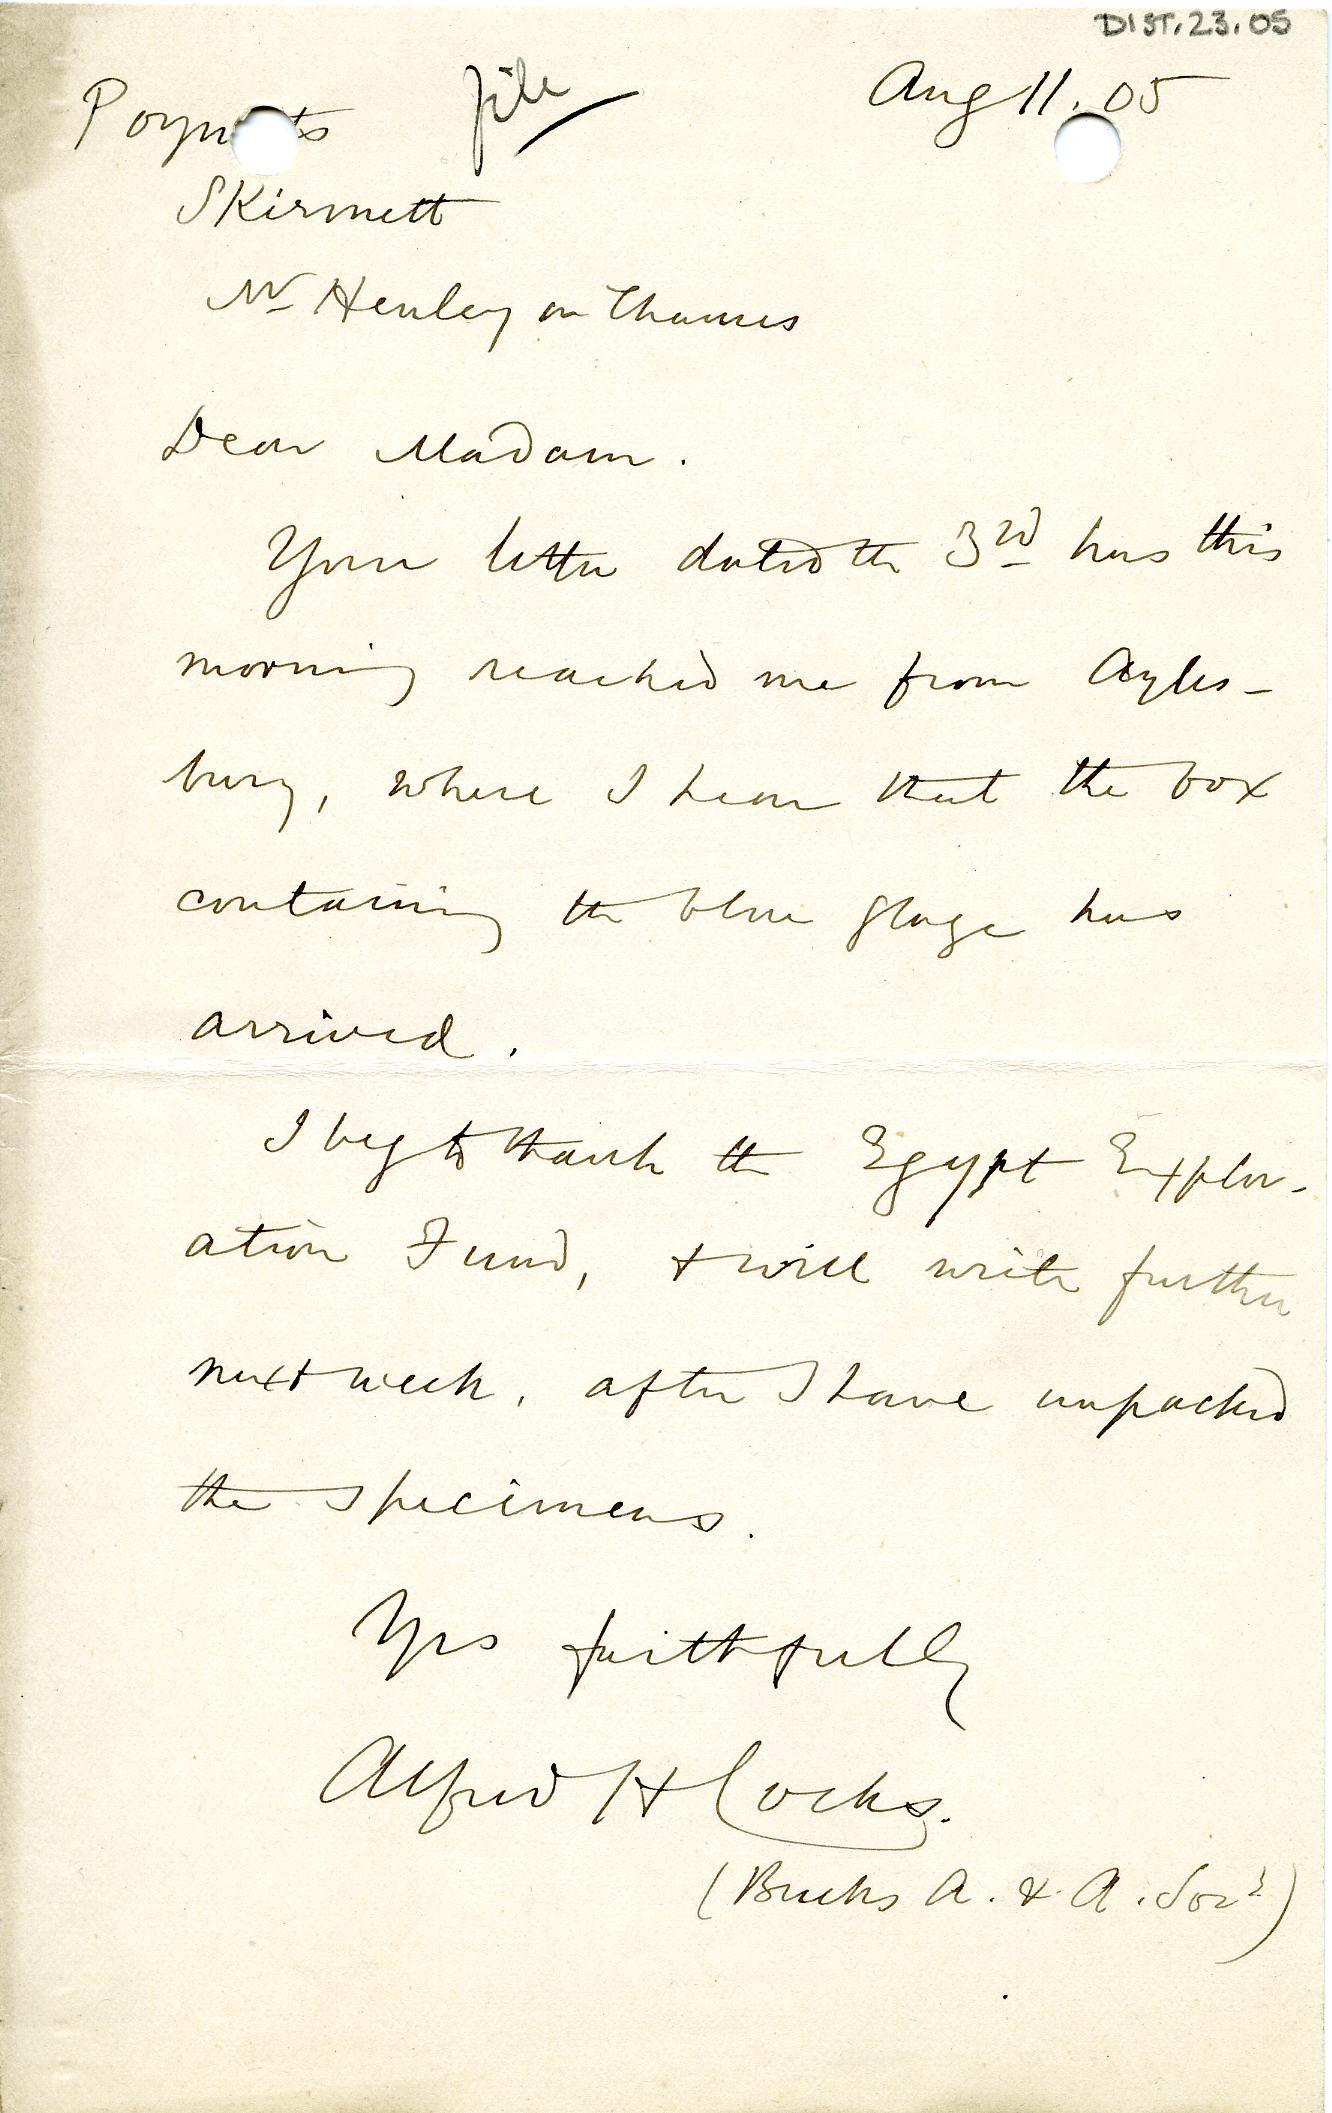 1904-05 Sinai, Deir el-Bahri, Oxyrhynchus, Naukratis DIST.23.05